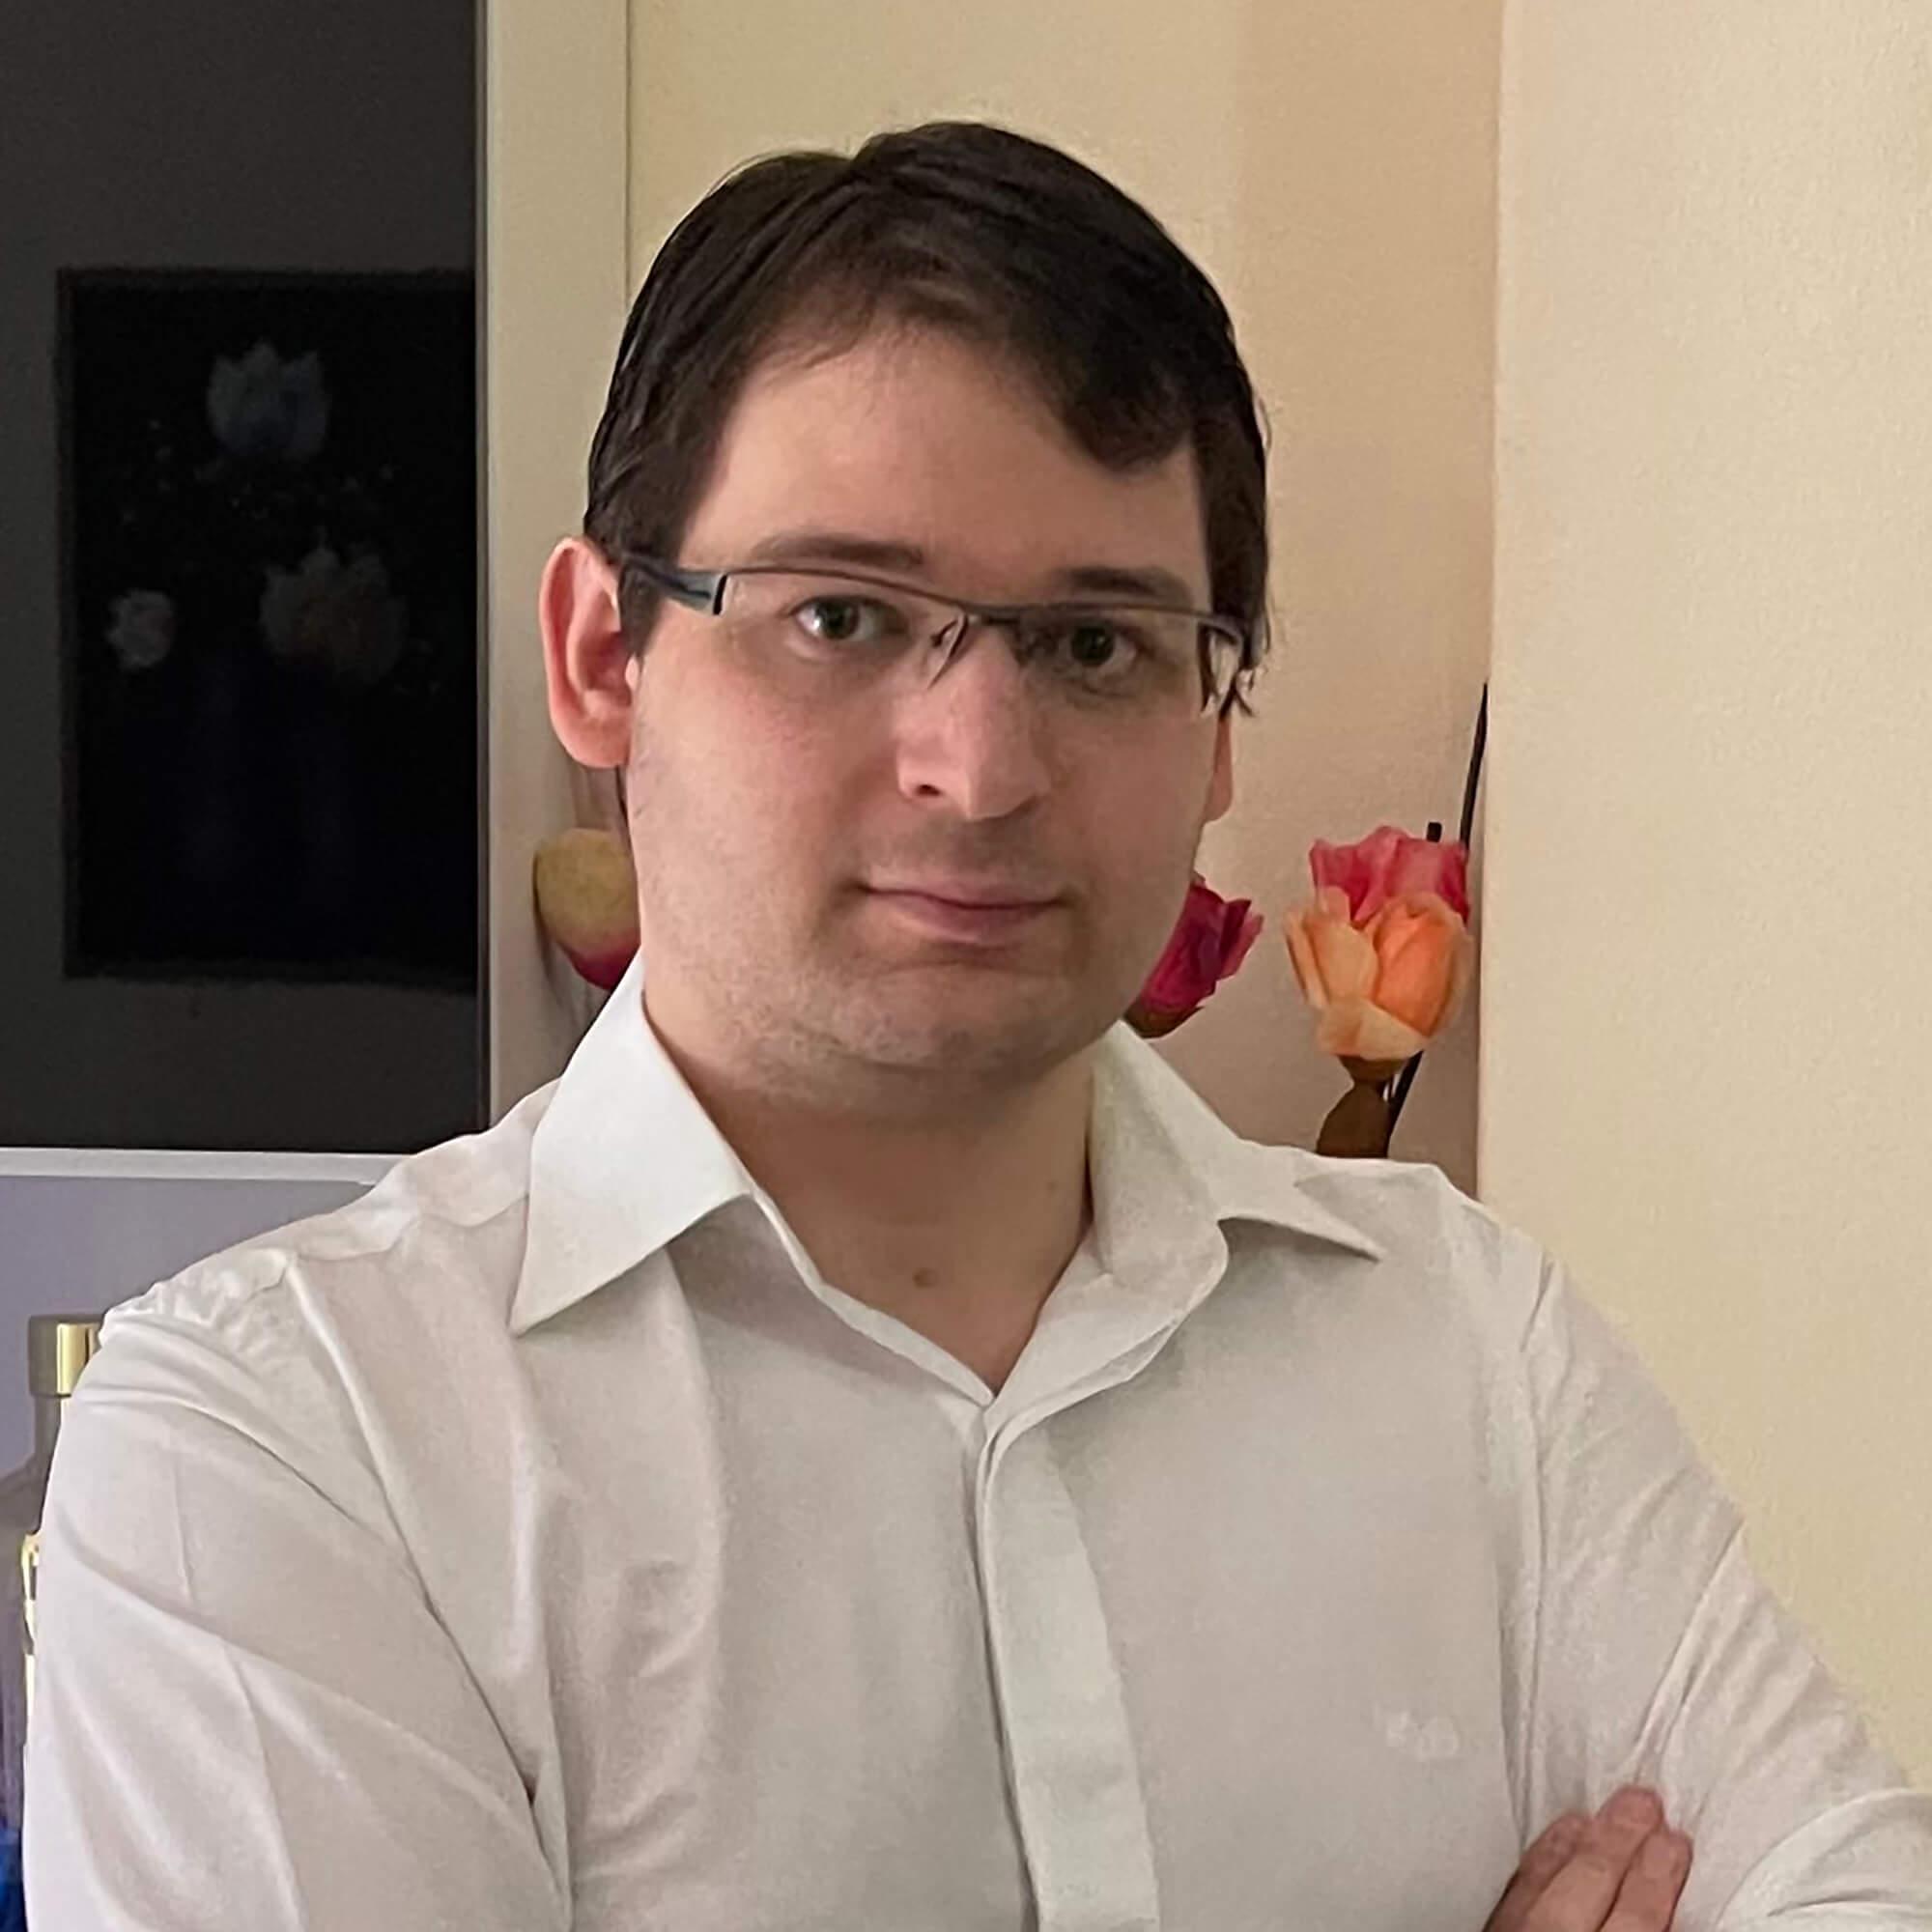 Headshot of Georgios Rousos